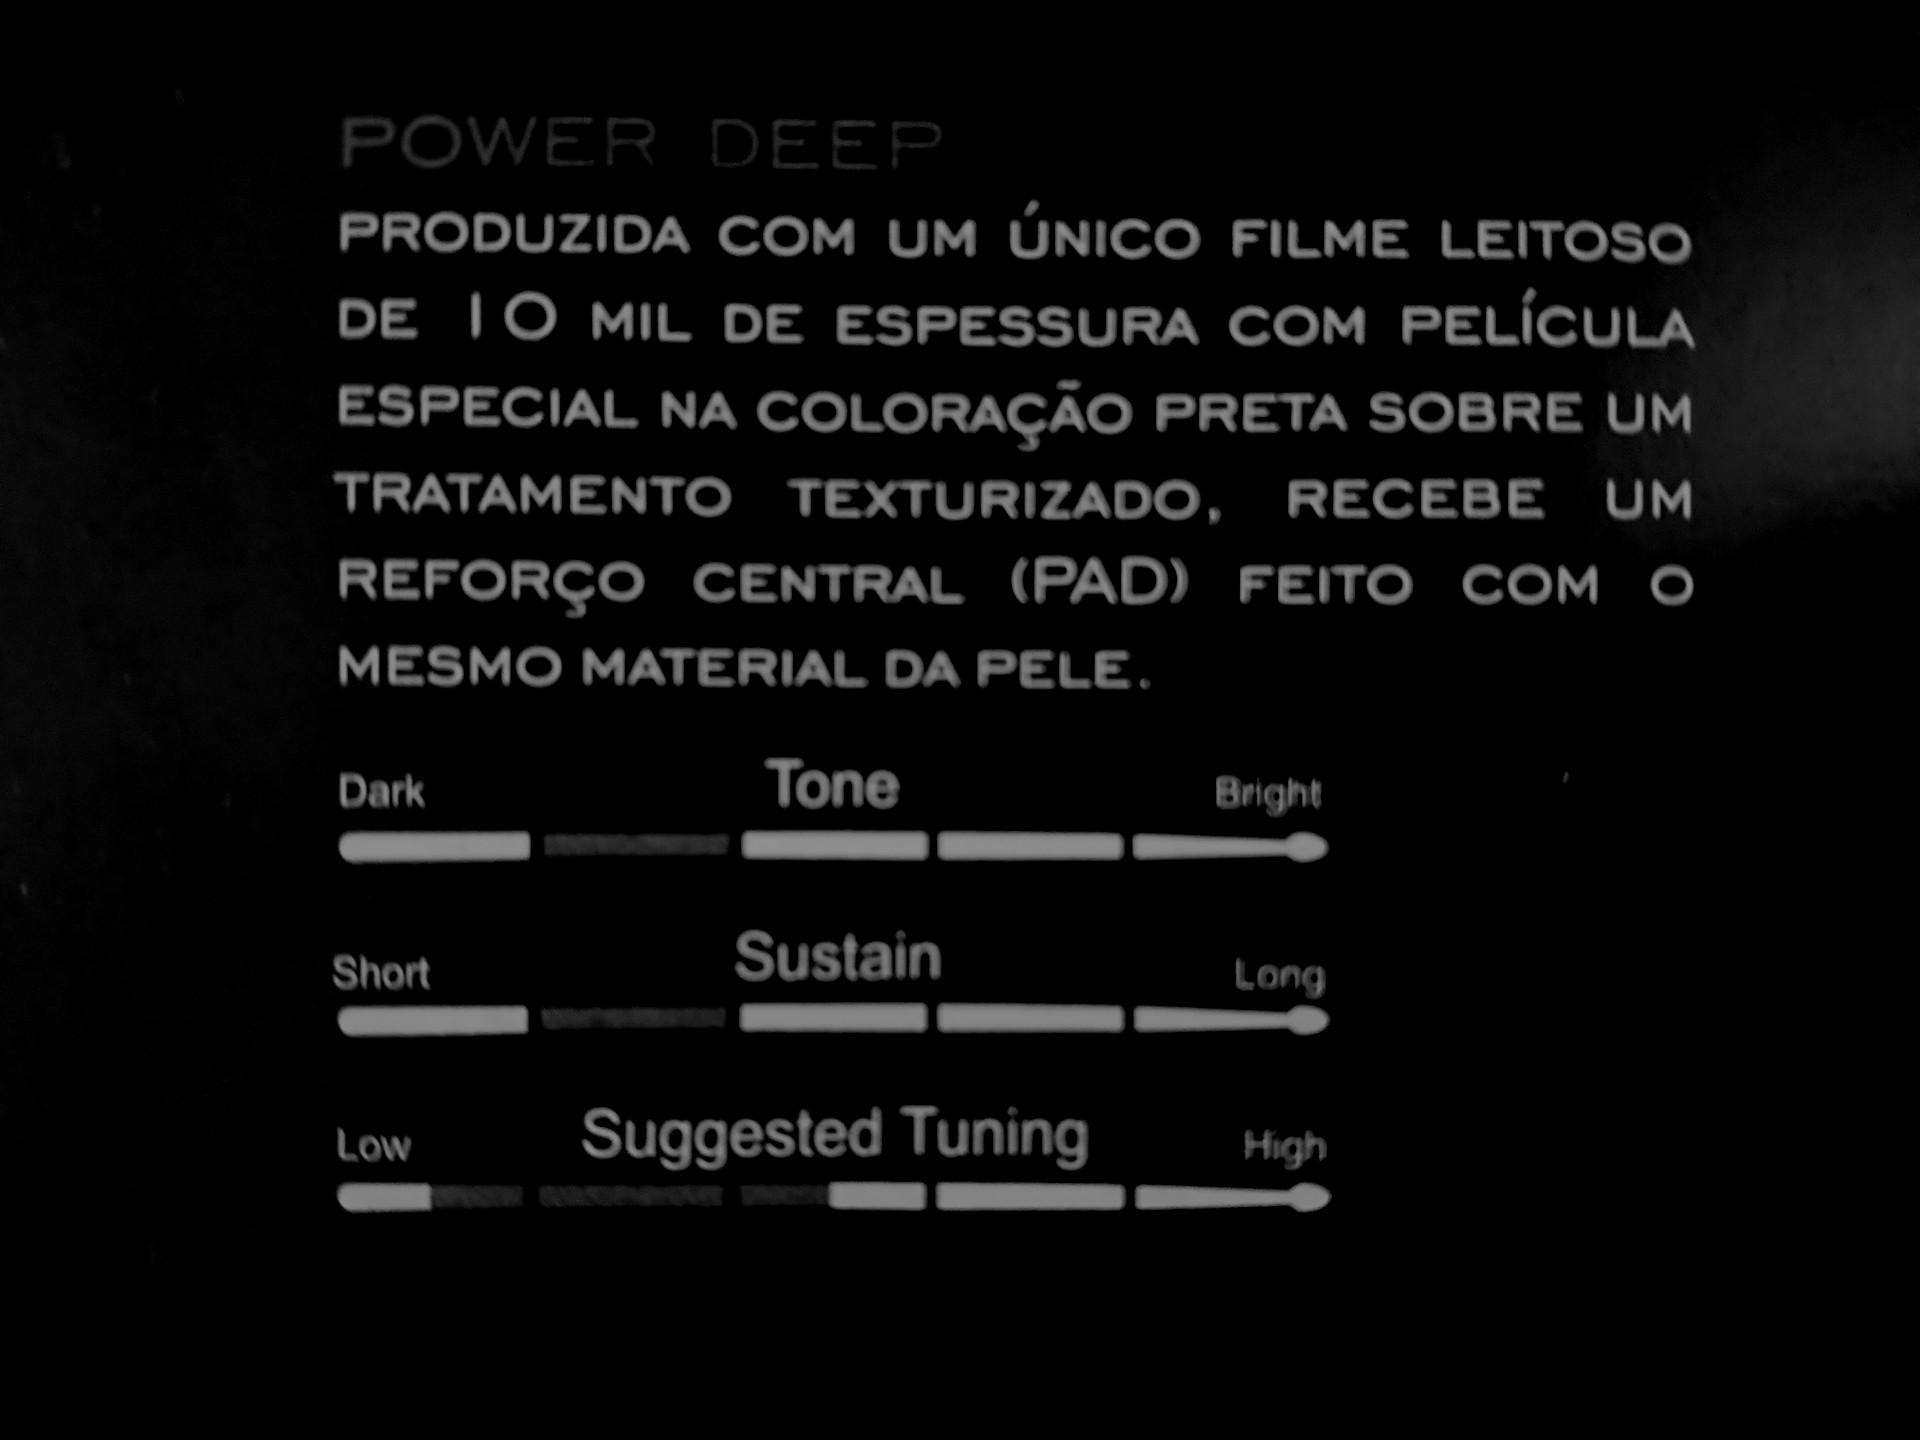 "Pele texturizada POWER DEEP C/ PAD 18"" Dudu Portes, LUEN."